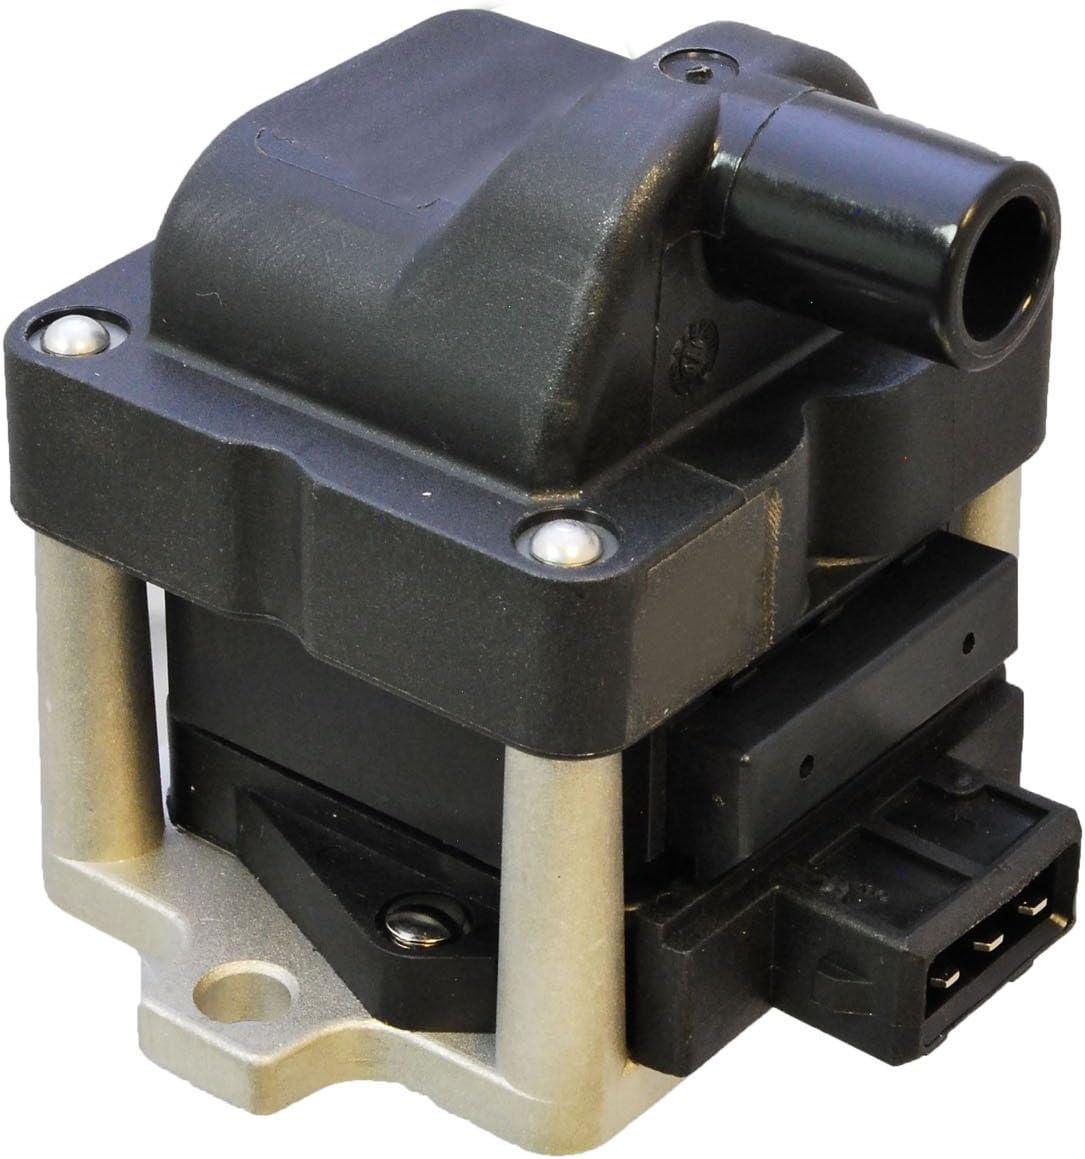 Beck Arnley 173-1363 Ignition Rotor BEC173-1363